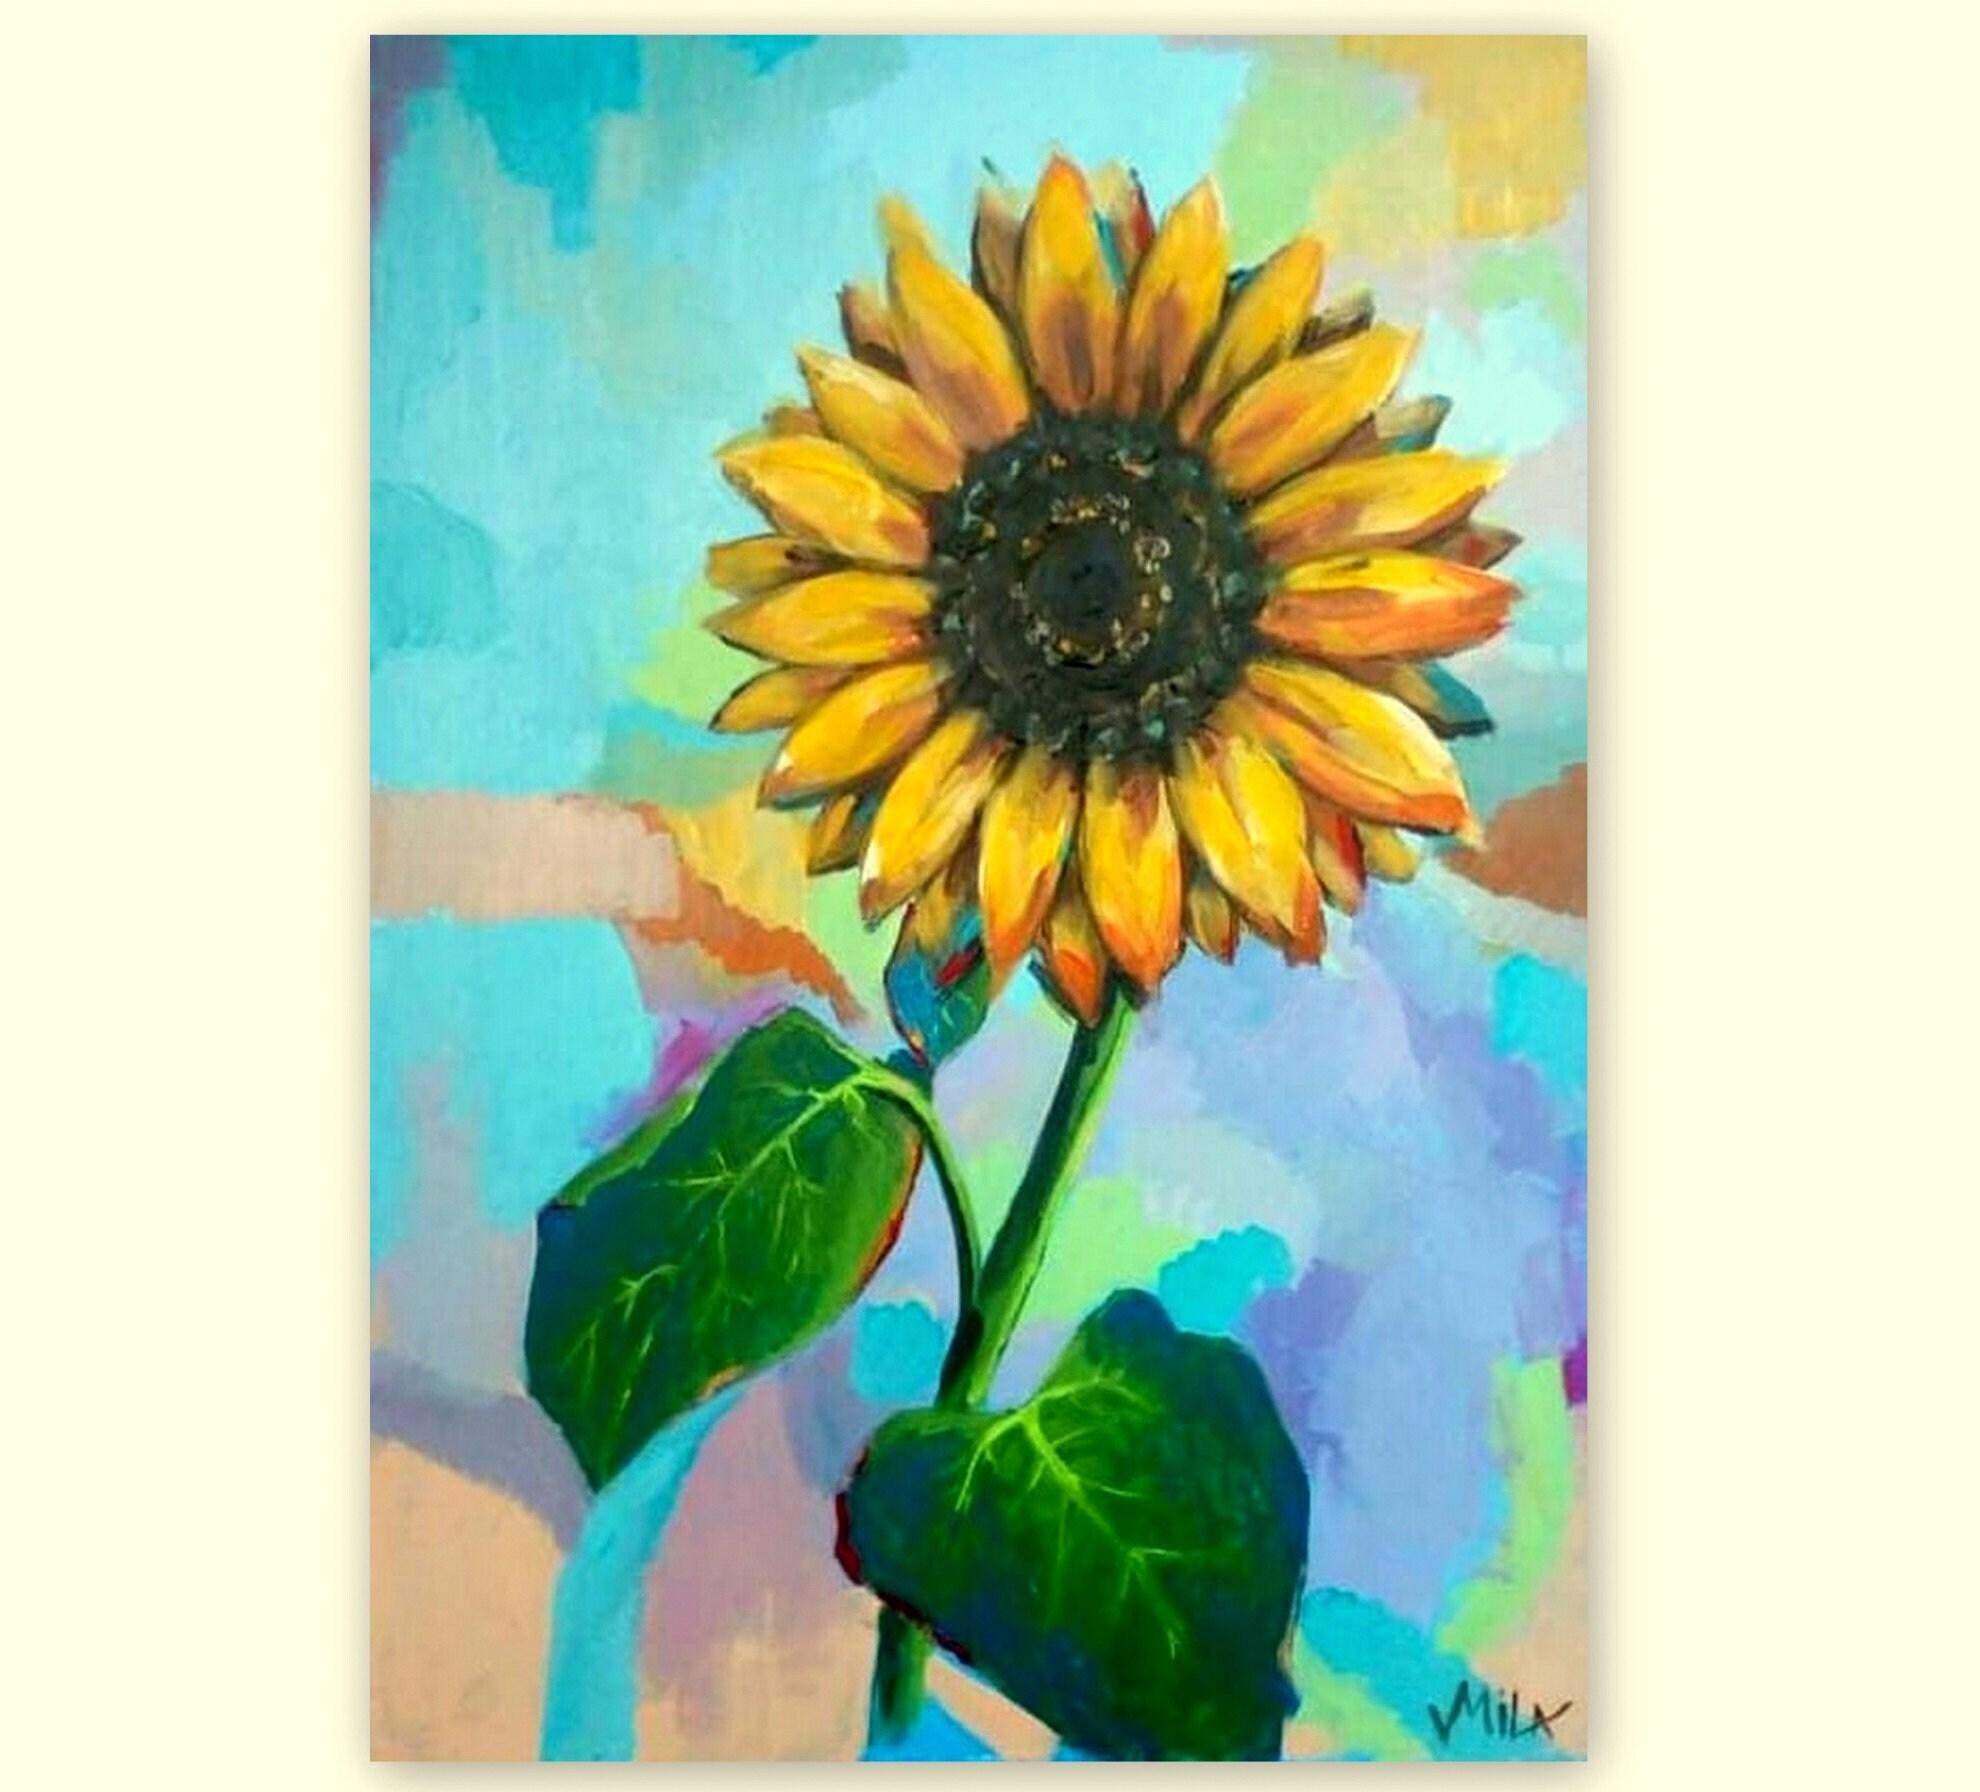 Sunflower original painting canvas acrylic art yellow sunflowers original canvas wall art